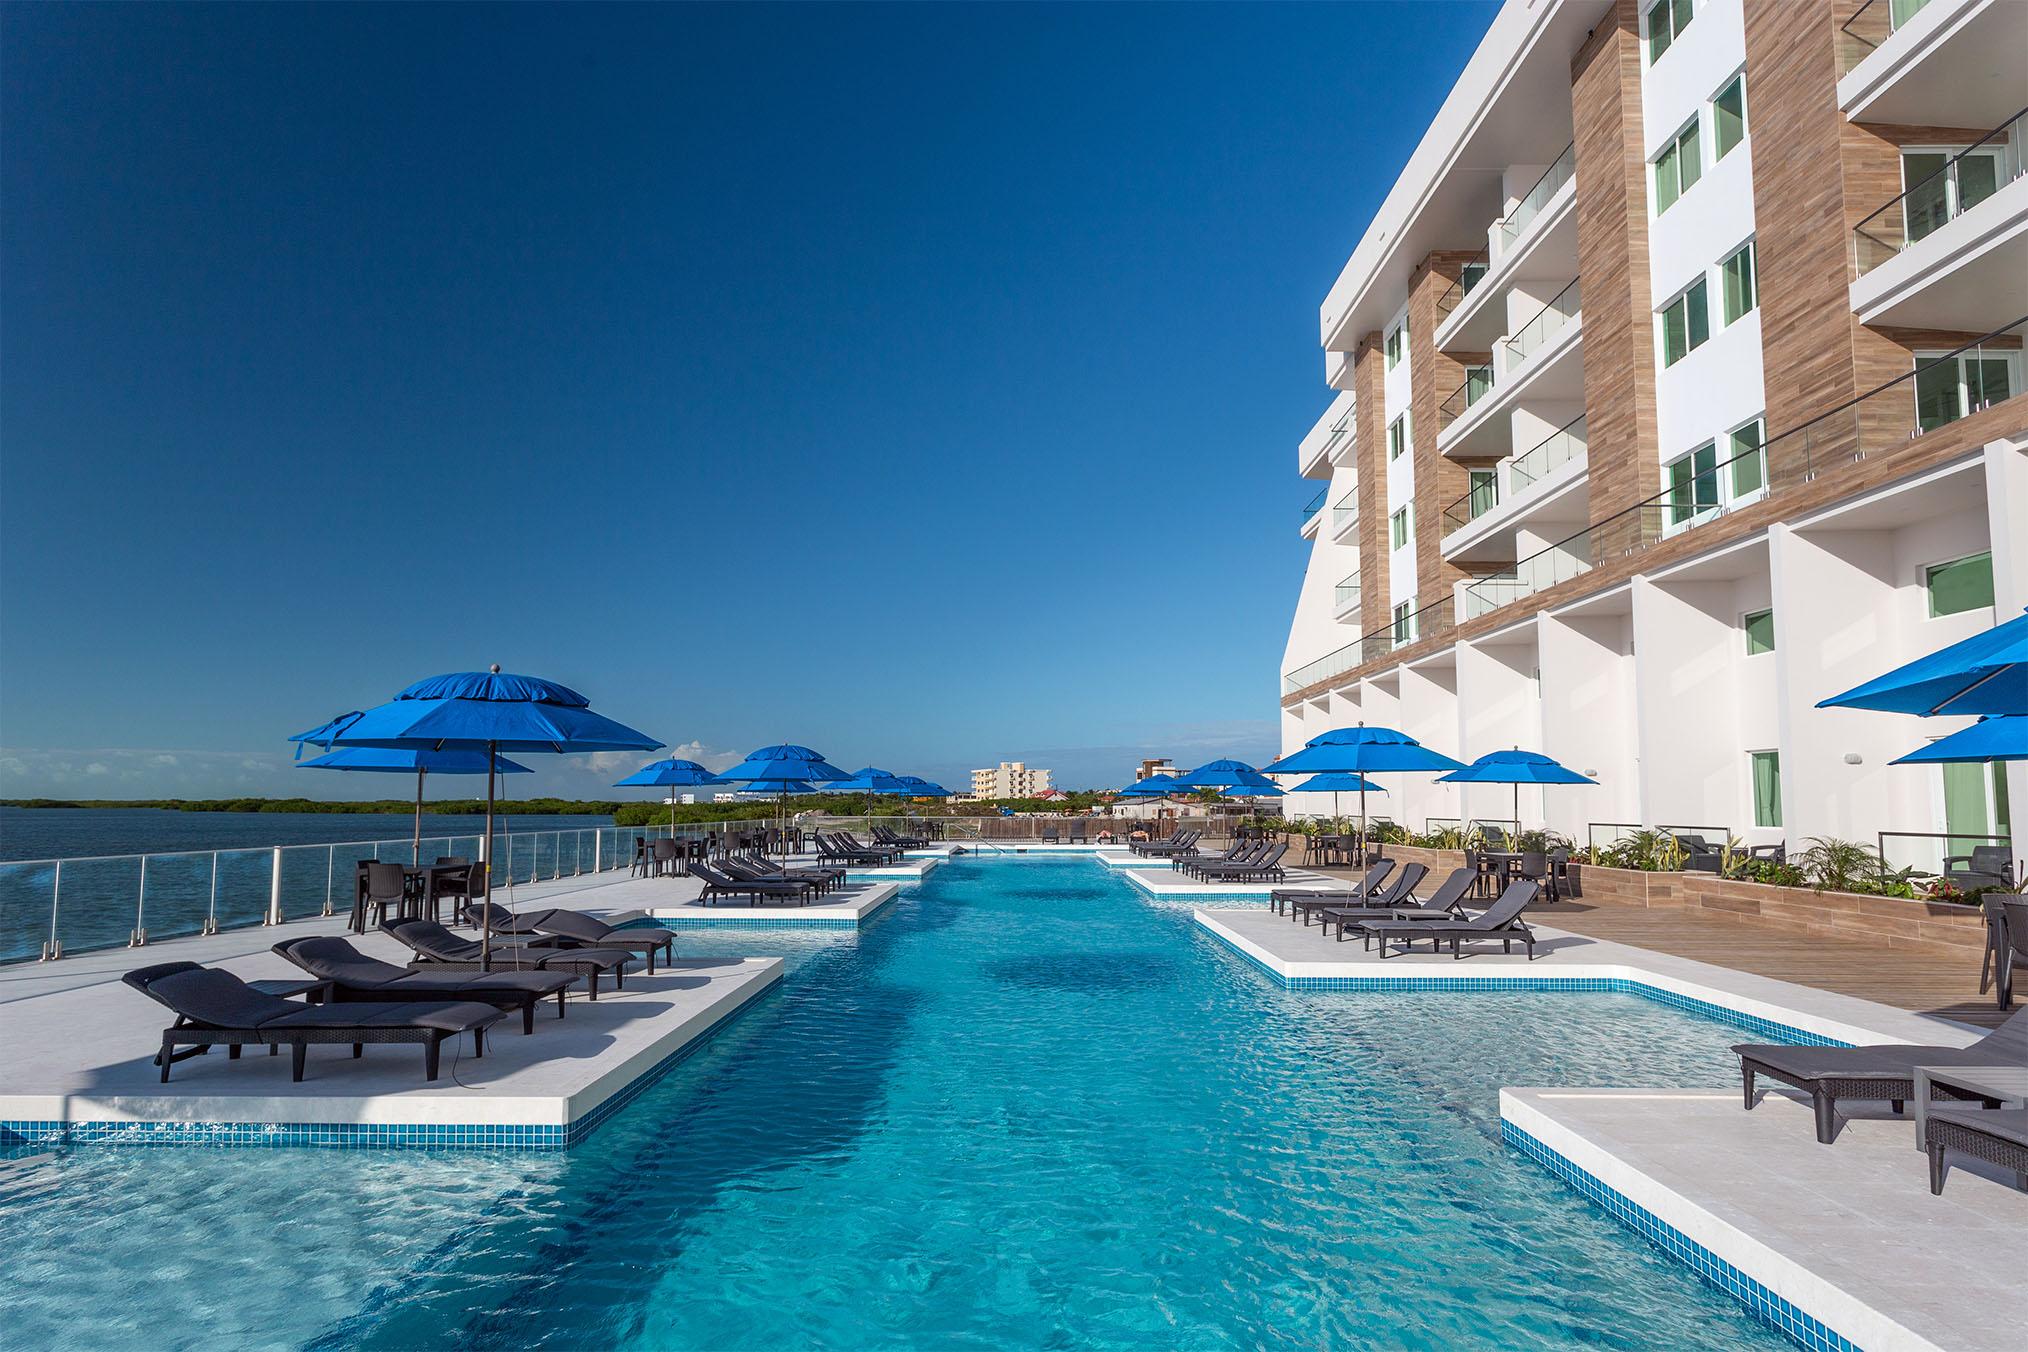 Sunset Caribe – Pool Side